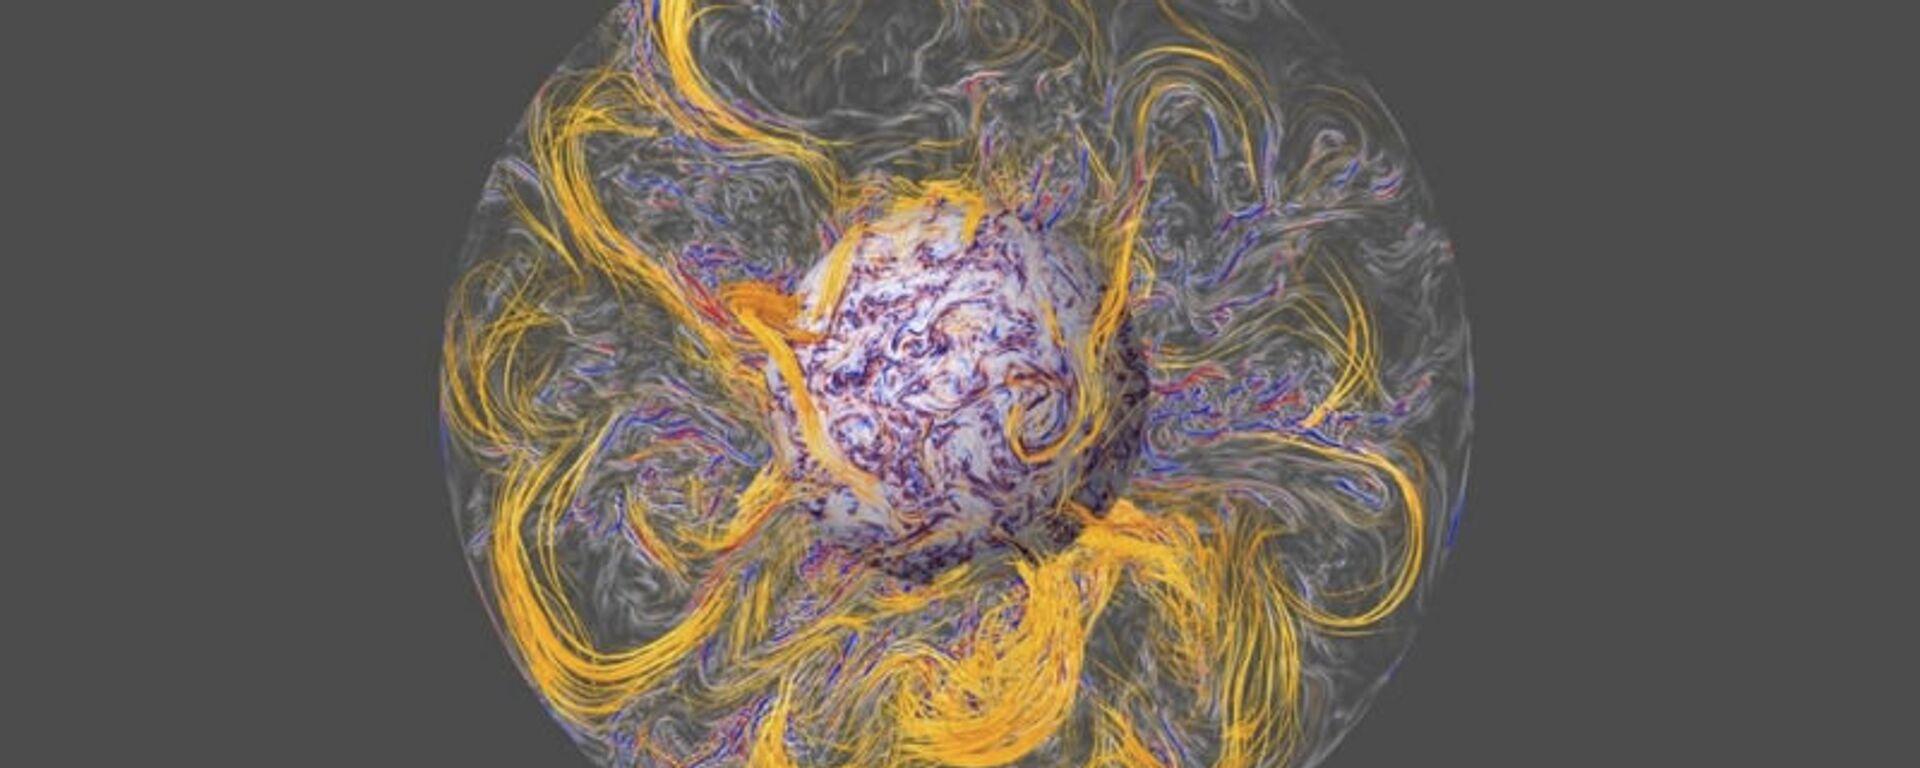 A simulation of the Earth's magnetic field - Sputnik International, 1920, 20.08.2021